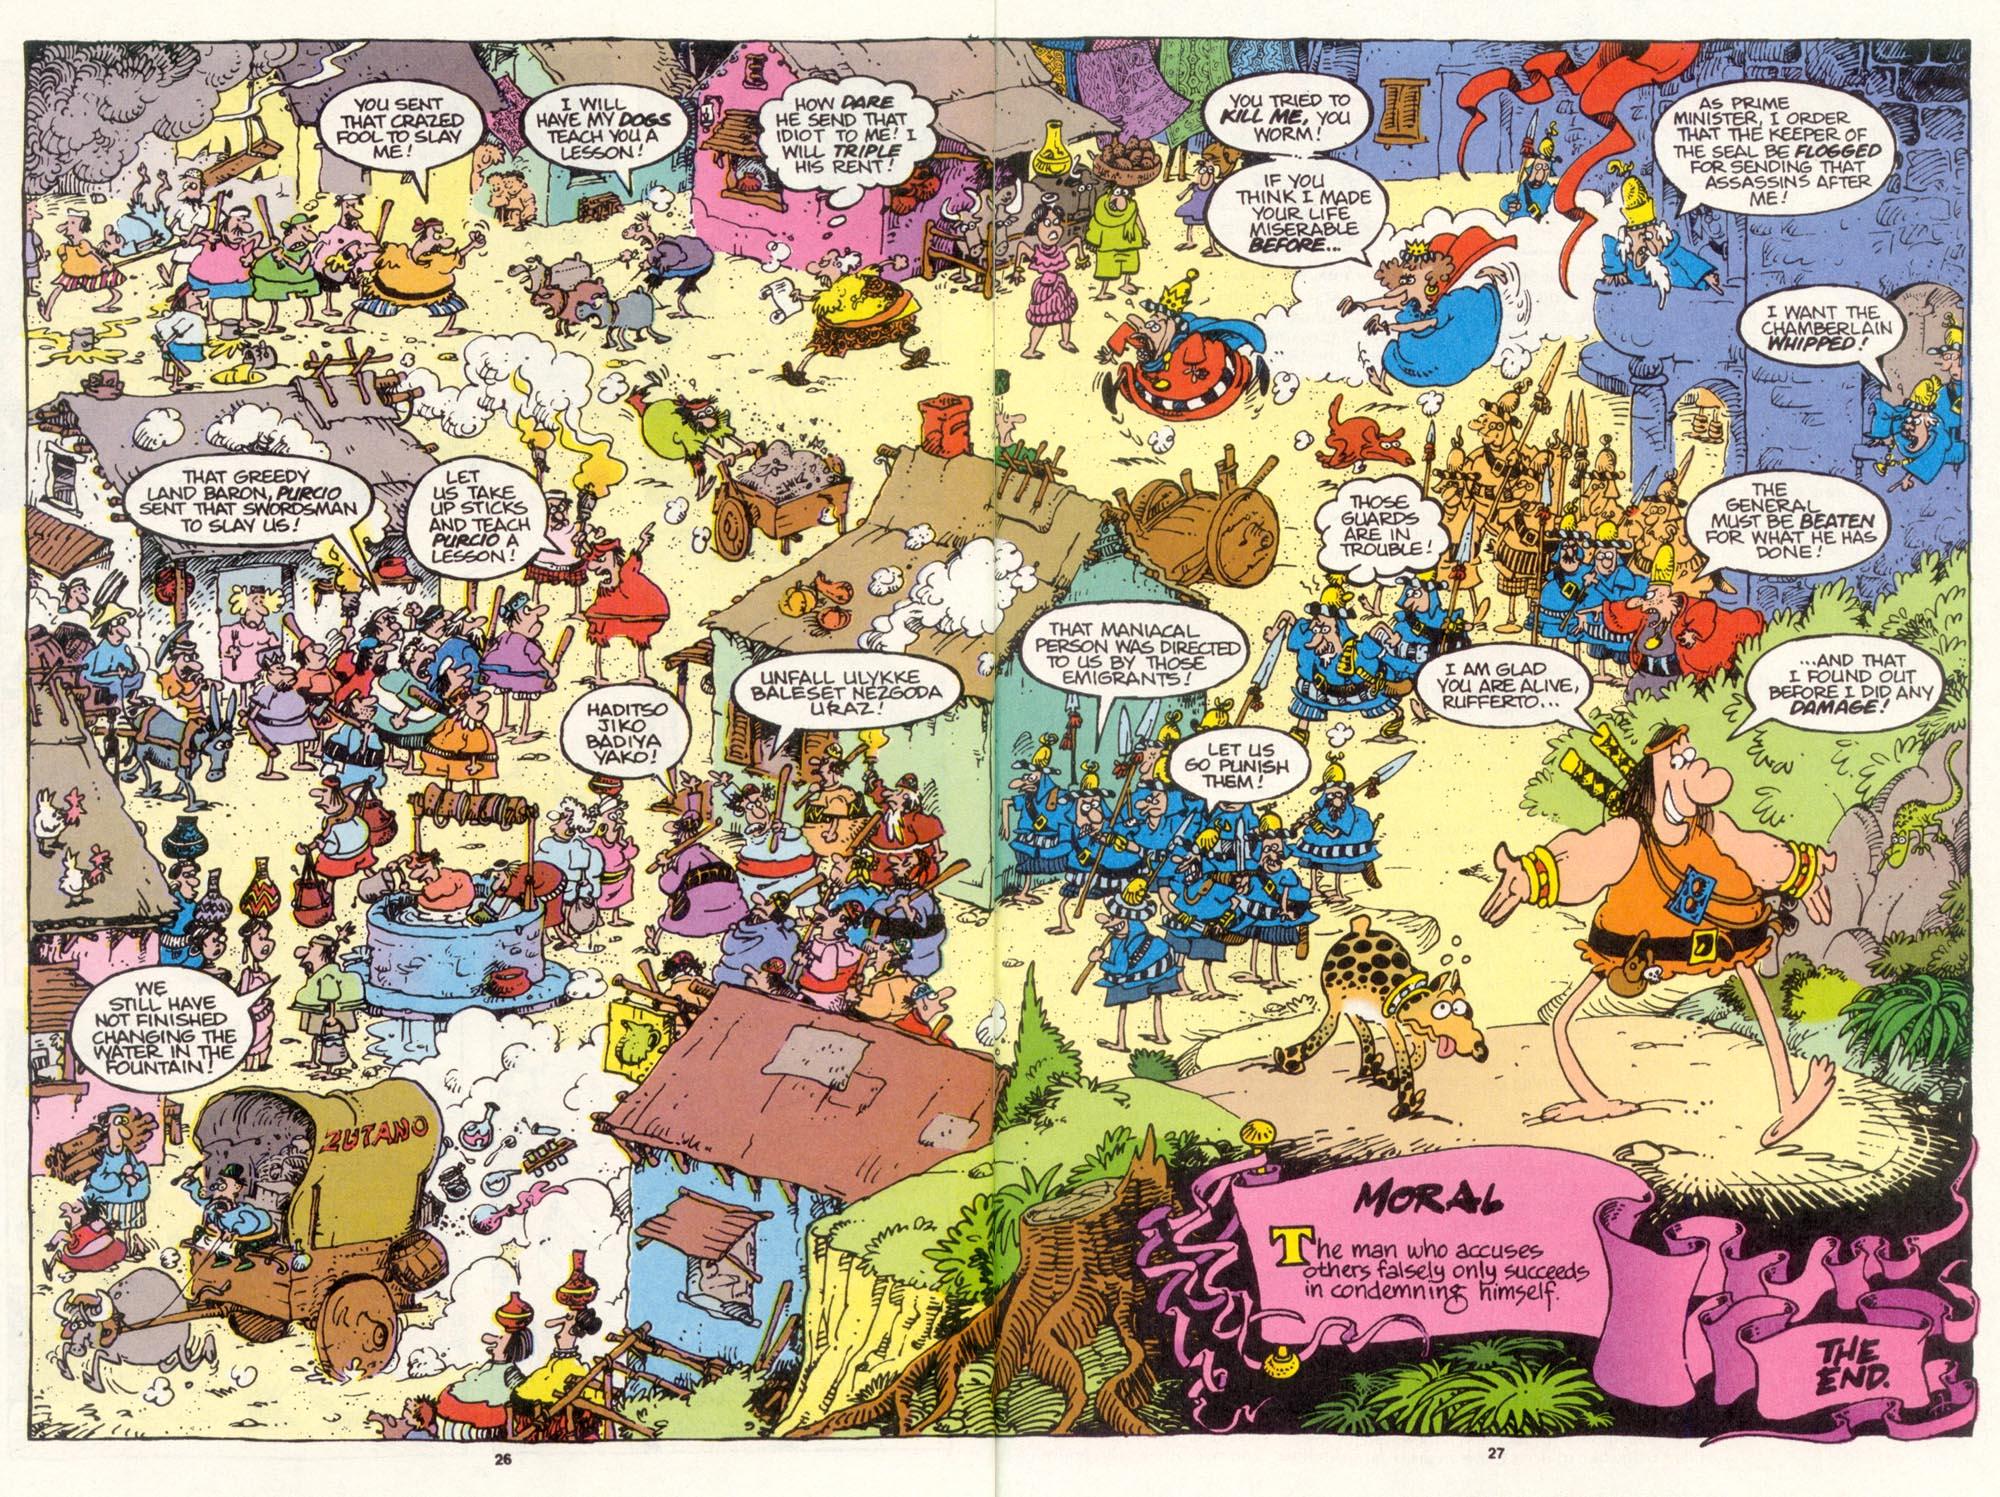 Read online Sergio Aragonés Groo the Wanderer comic -  Issue #112 - 28